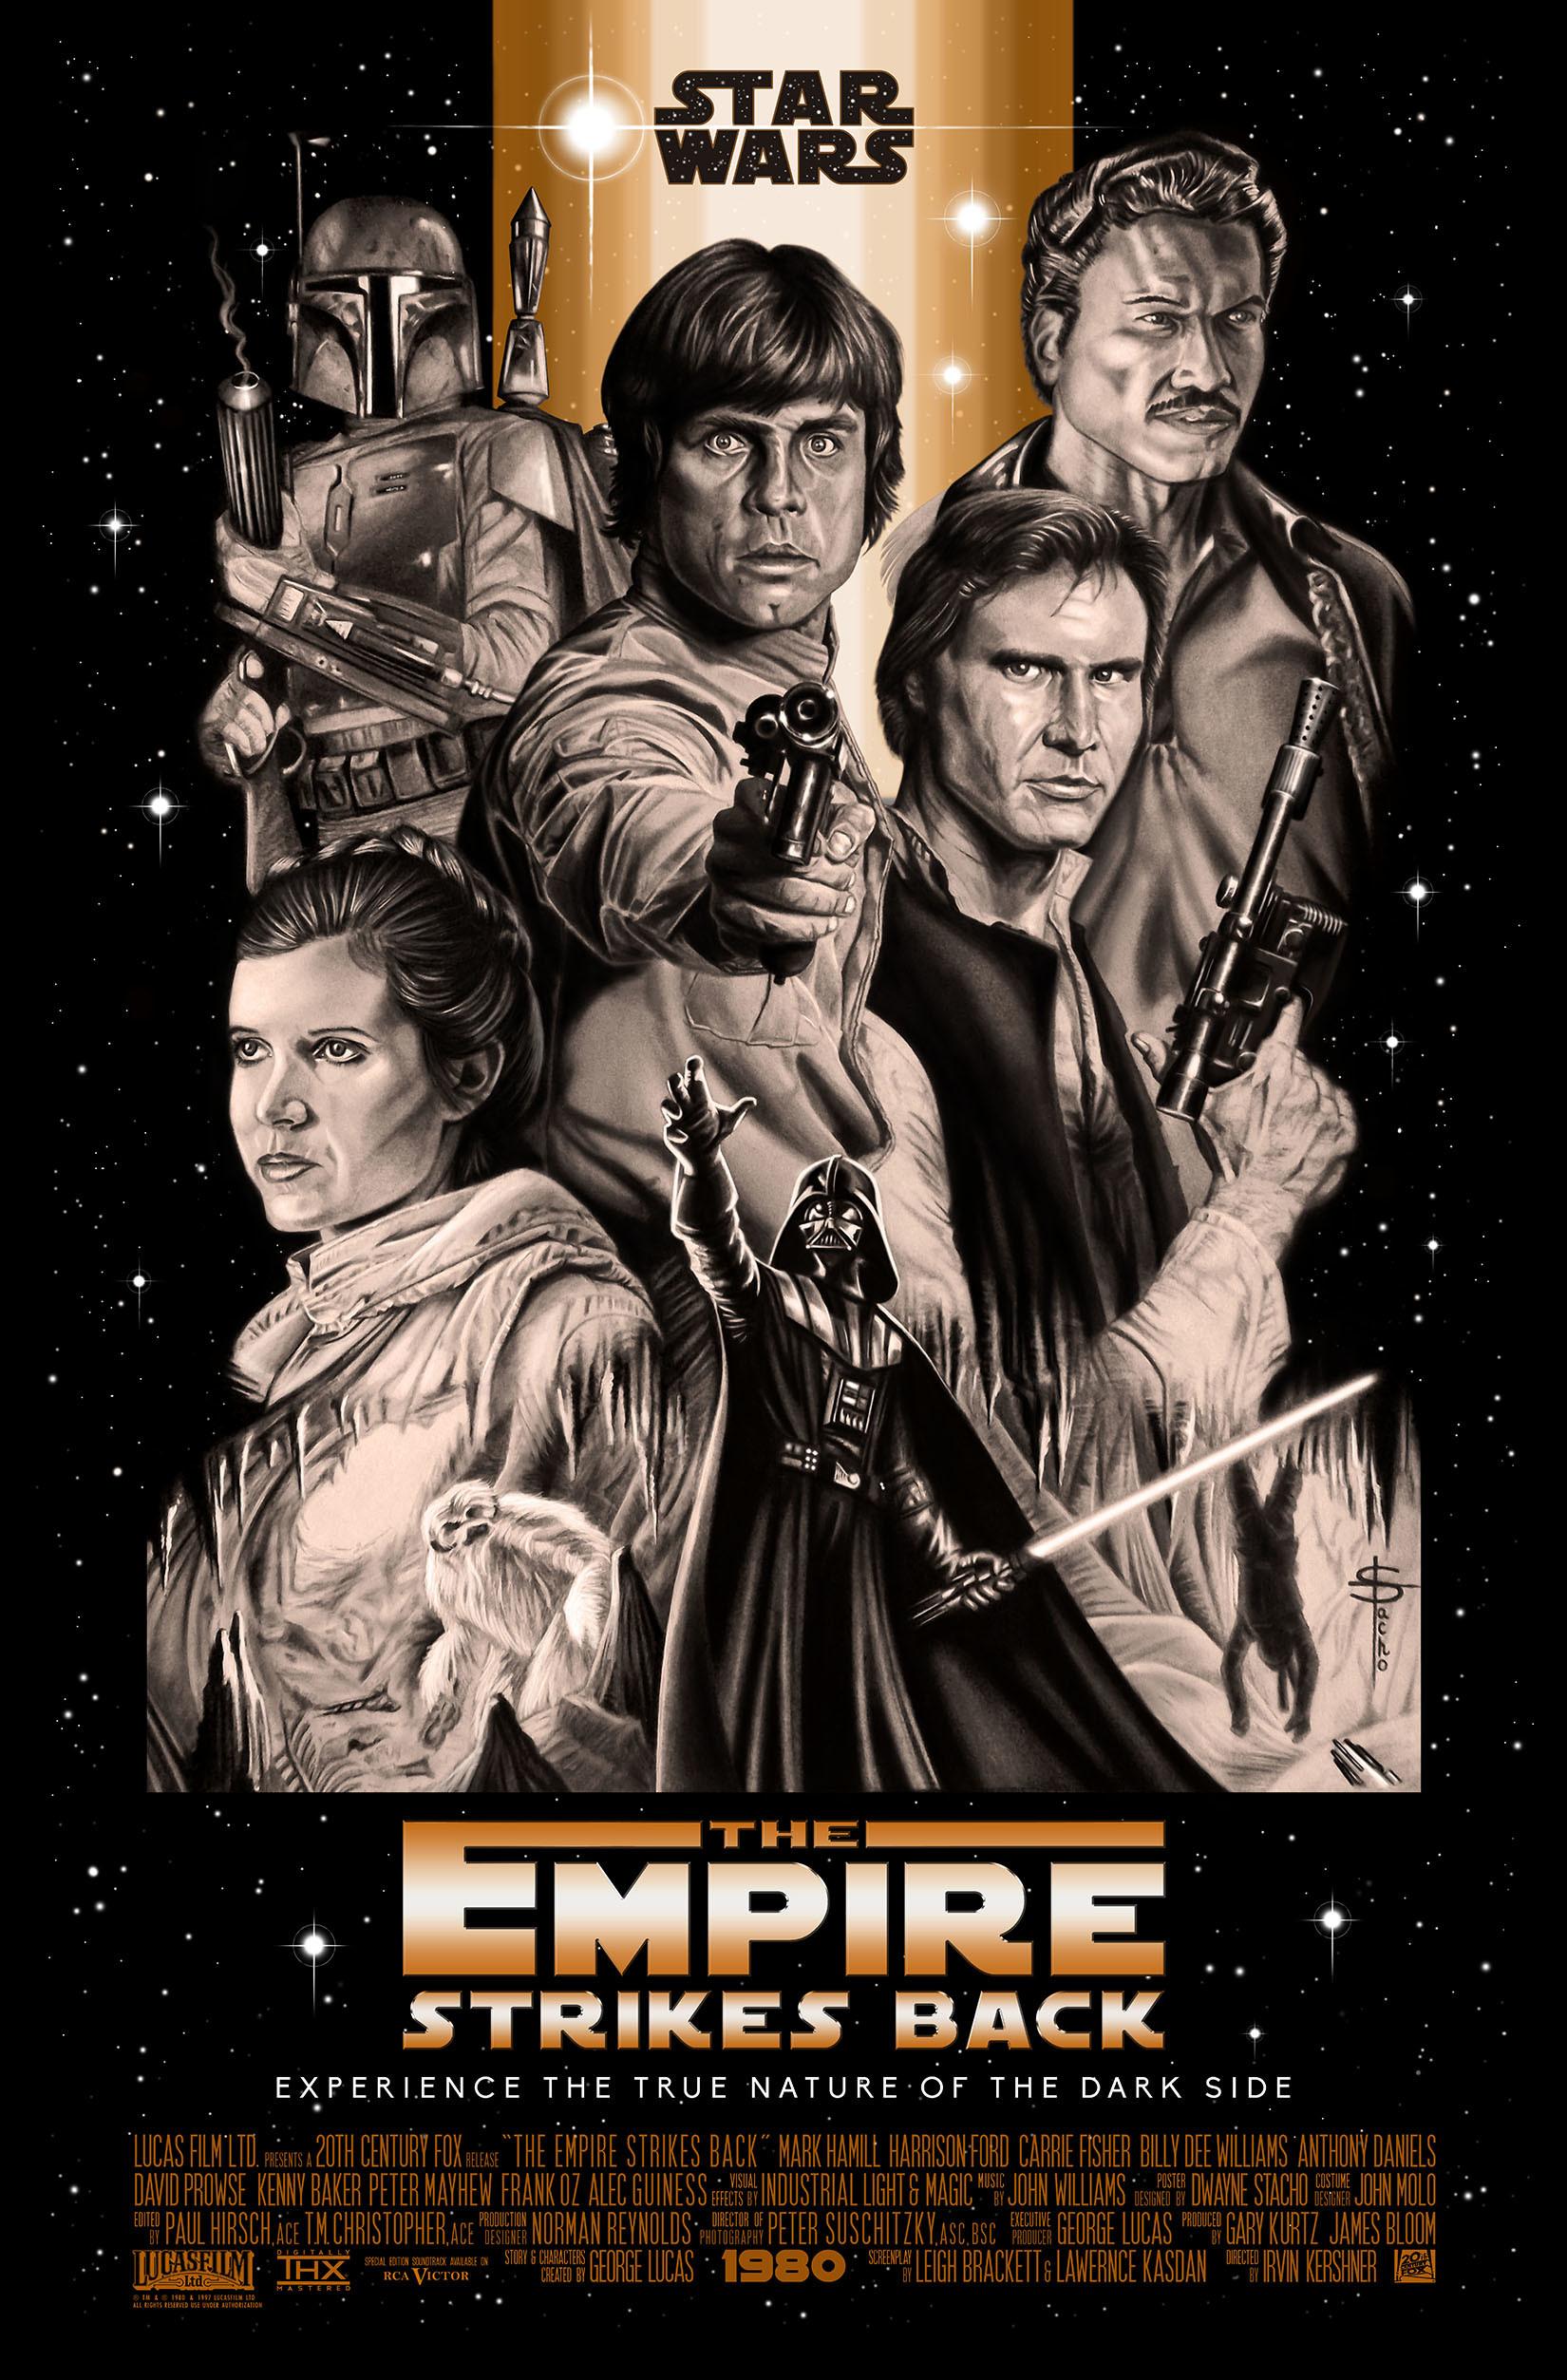 Dwayne stacho alternate star wars poster low res